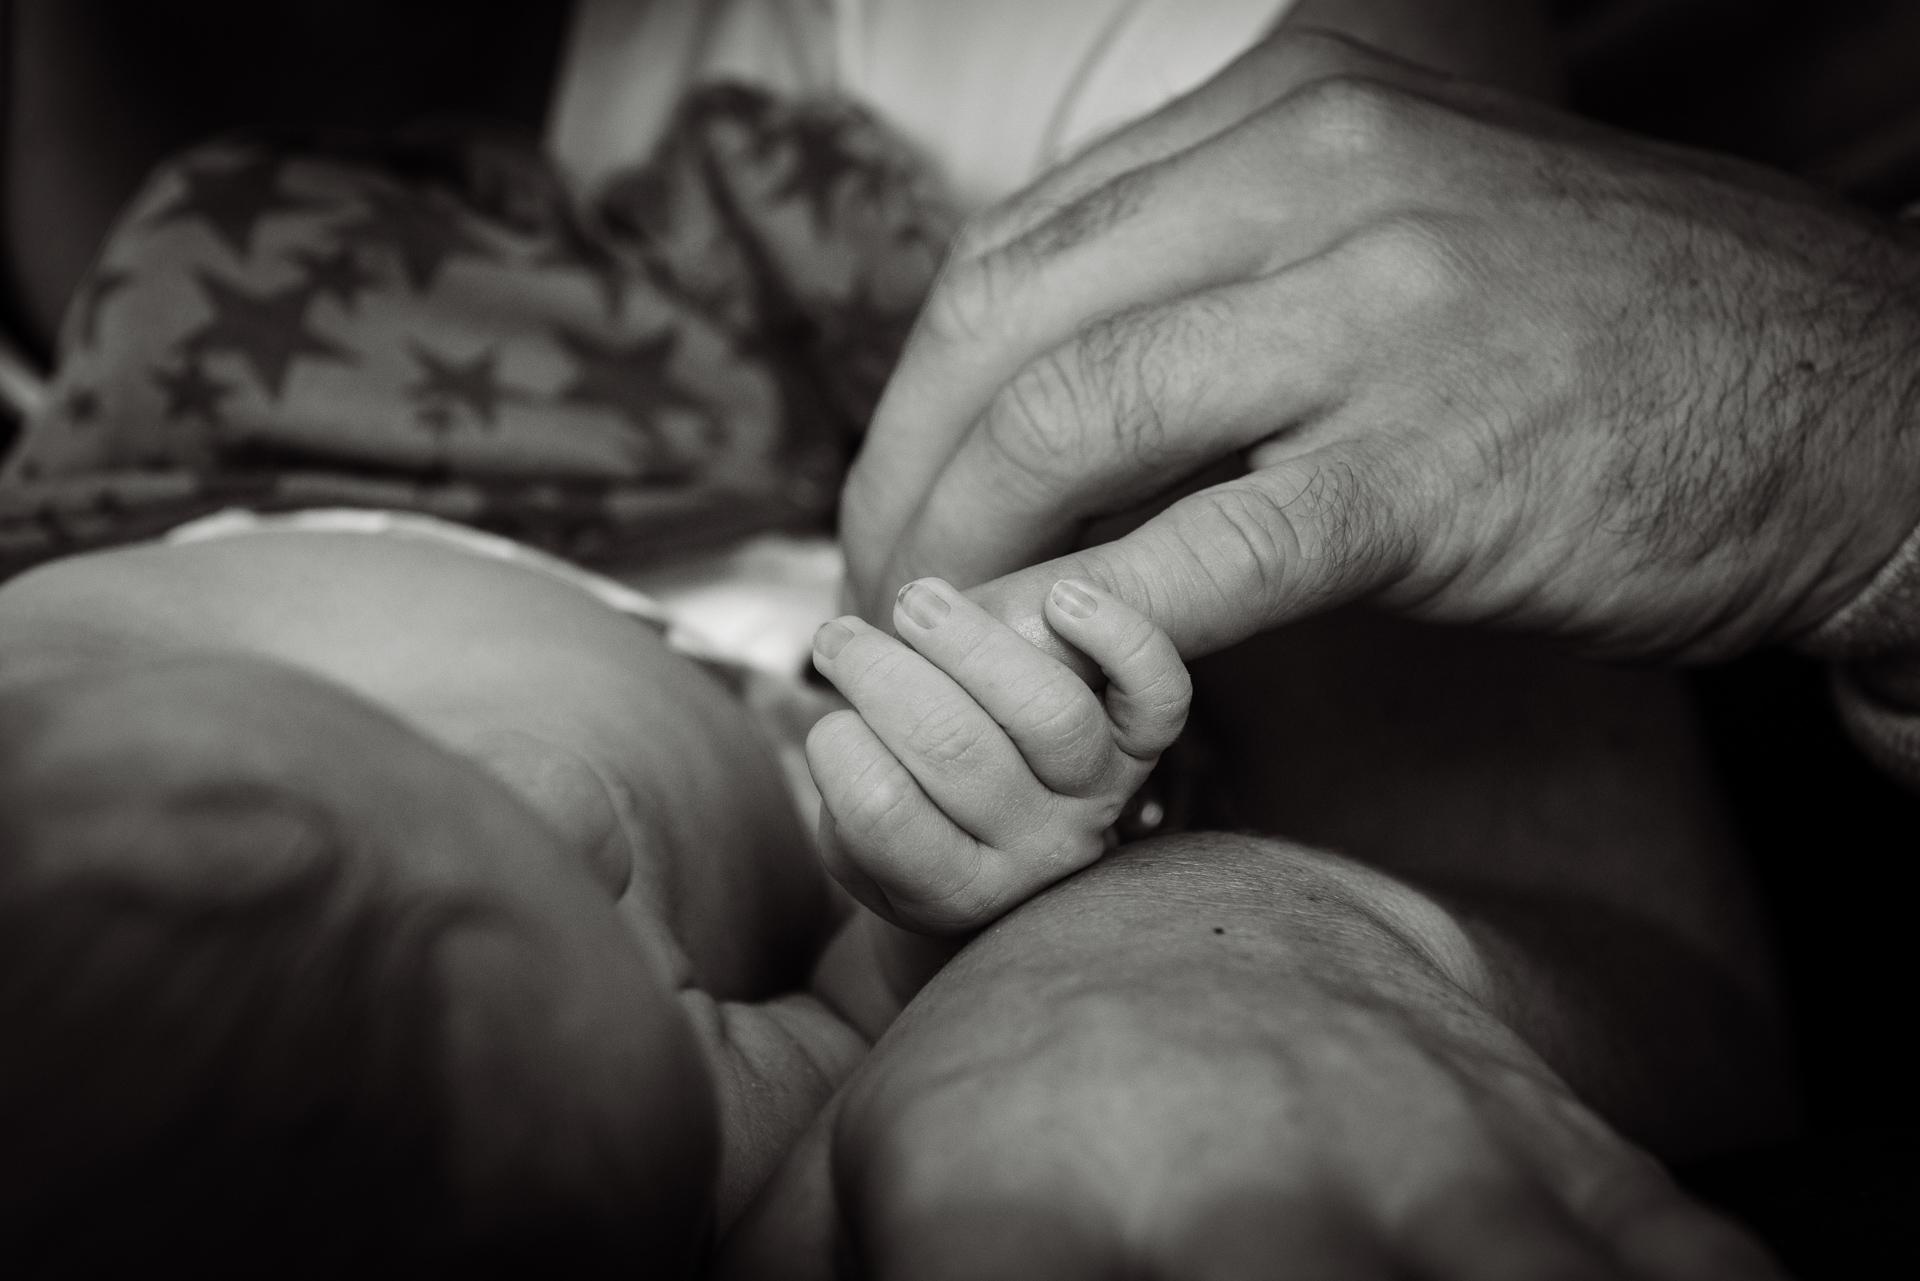 Theo_nyfødt_newborn_baby_14